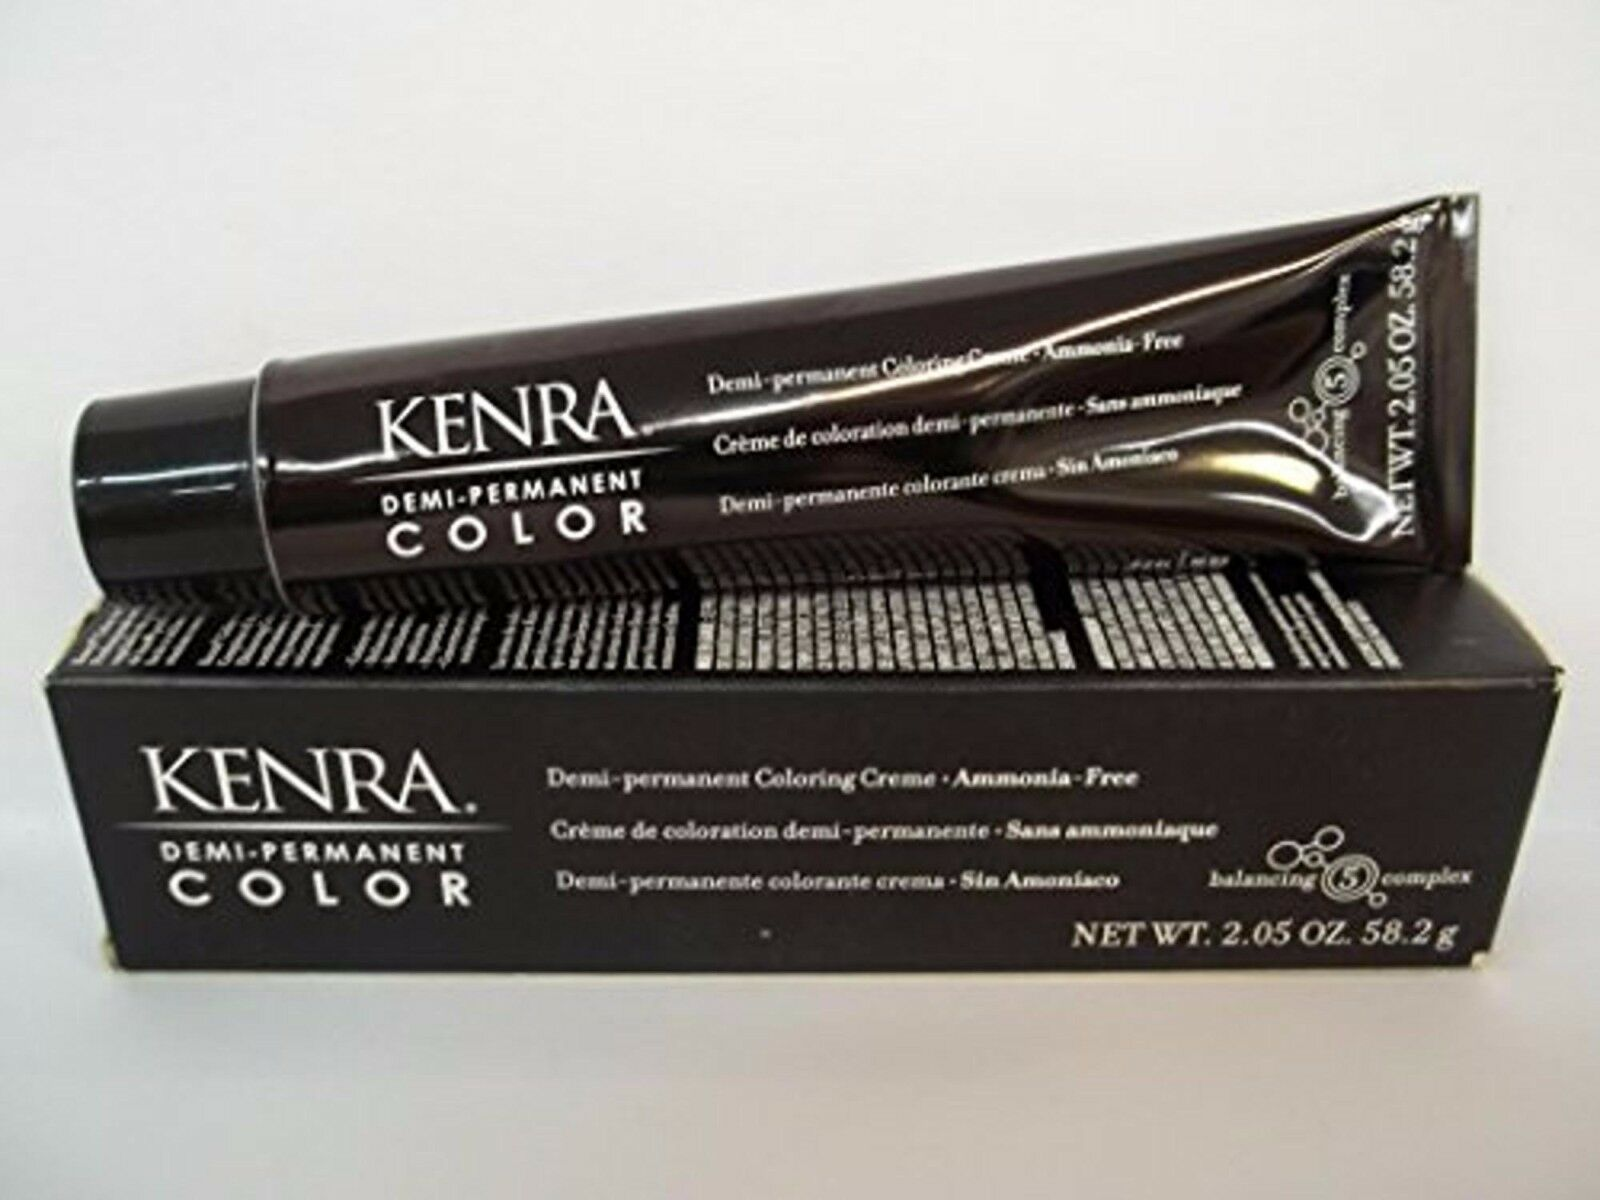 Kenra Demi-Perm Coloring Cream 3 VR Dark Brown Violet Red